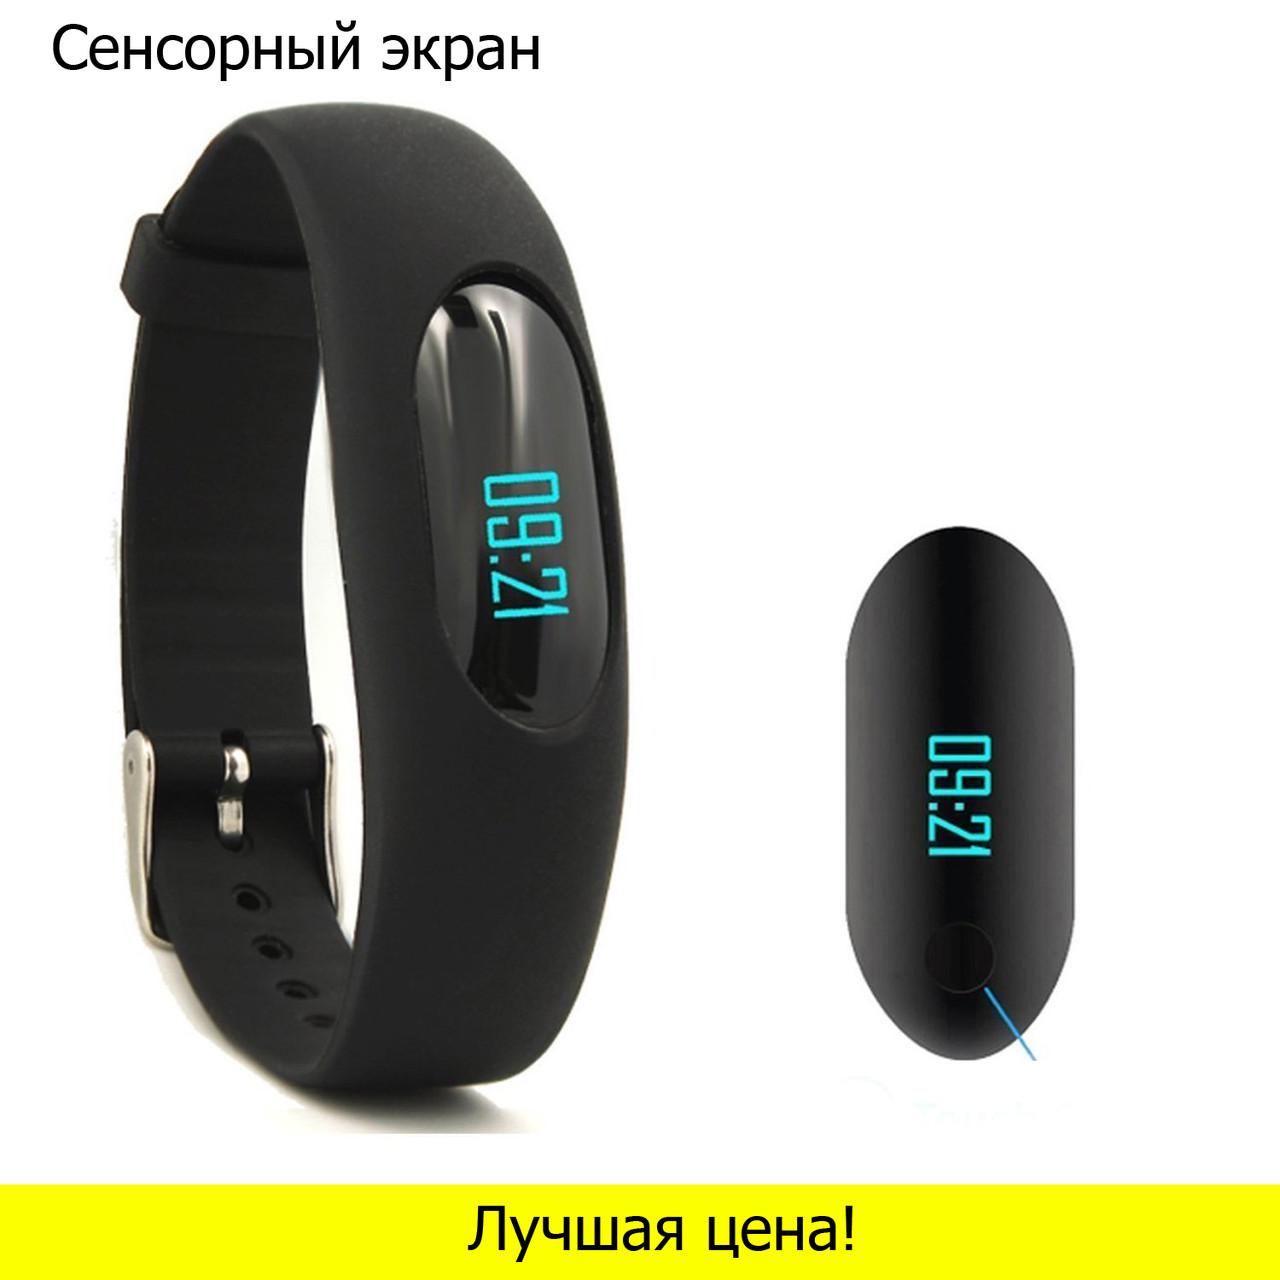 Smartband умный фитнес браслет WillFul SW 307